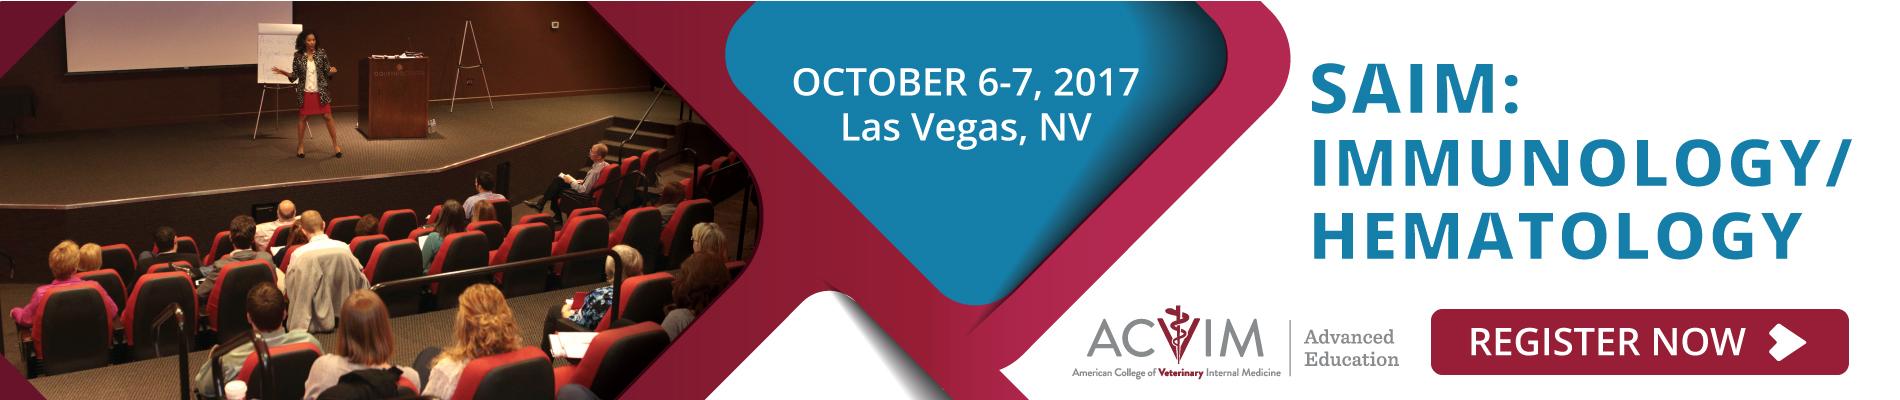 ACE_SAIMImmunologyHematology_Oct2017_ACVIMHomePage